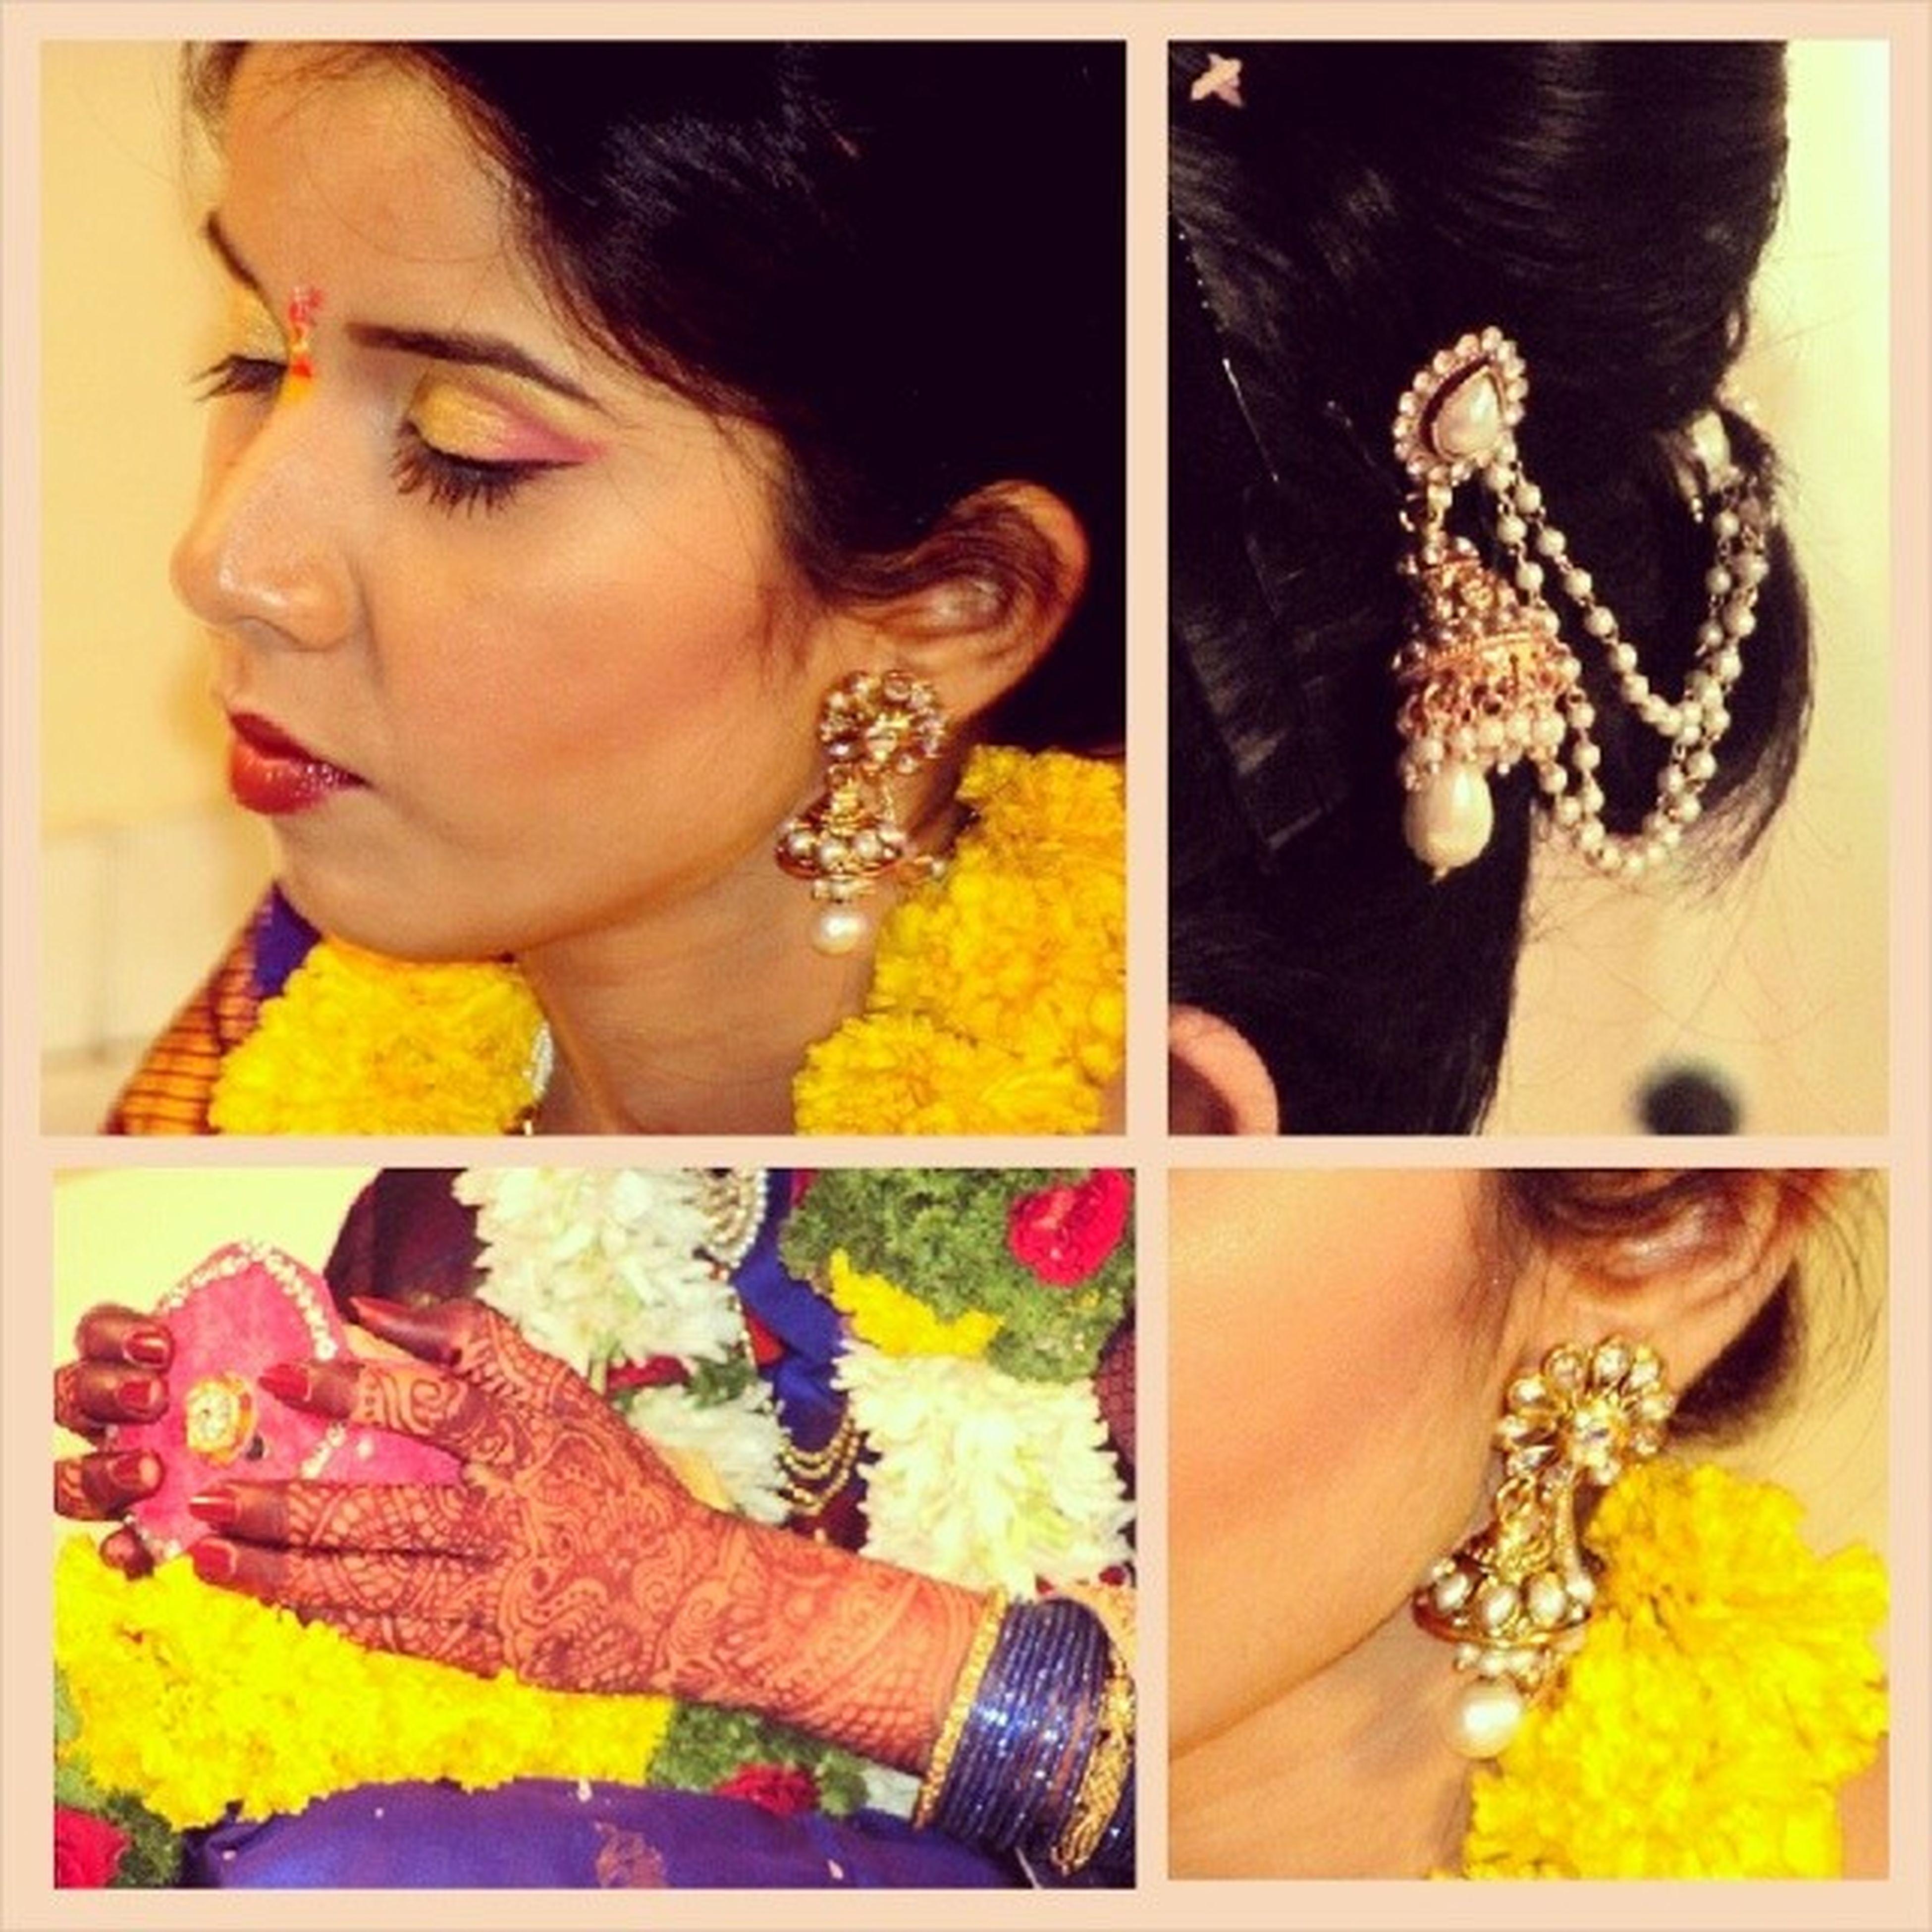 The bride to be.. Instagram Instafollow Engagement Mumbai Pune Wedding Cousin Photo Photooftheday Pic Photography Igers Tagsforlikes @tagdistrictfsl Photogrid @photogridorg Marathi Canon Pointtoshoot Focus F4F Likeforlike Follower